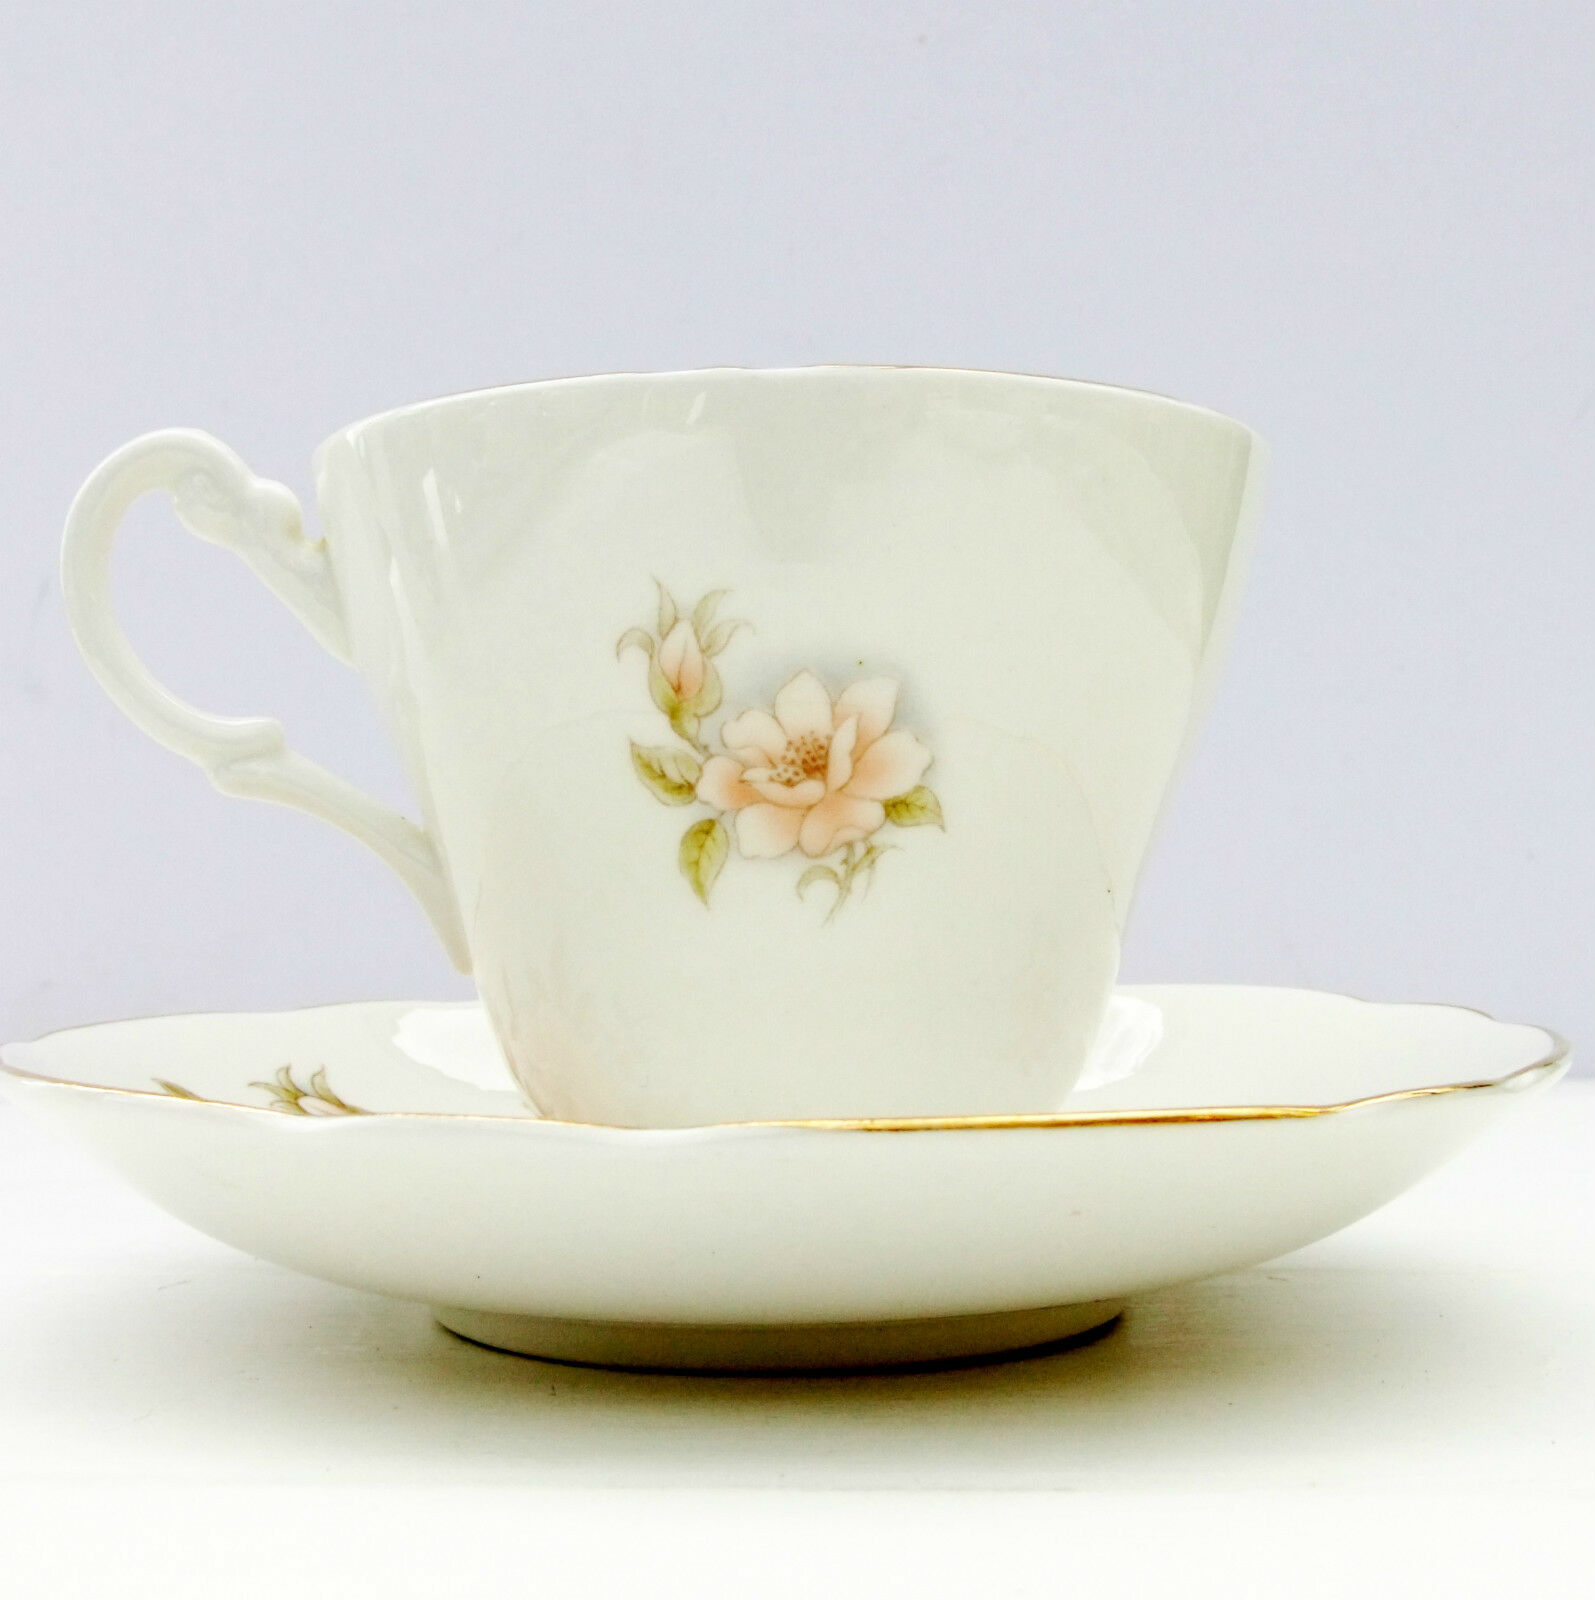 year dating royal stuart bone china